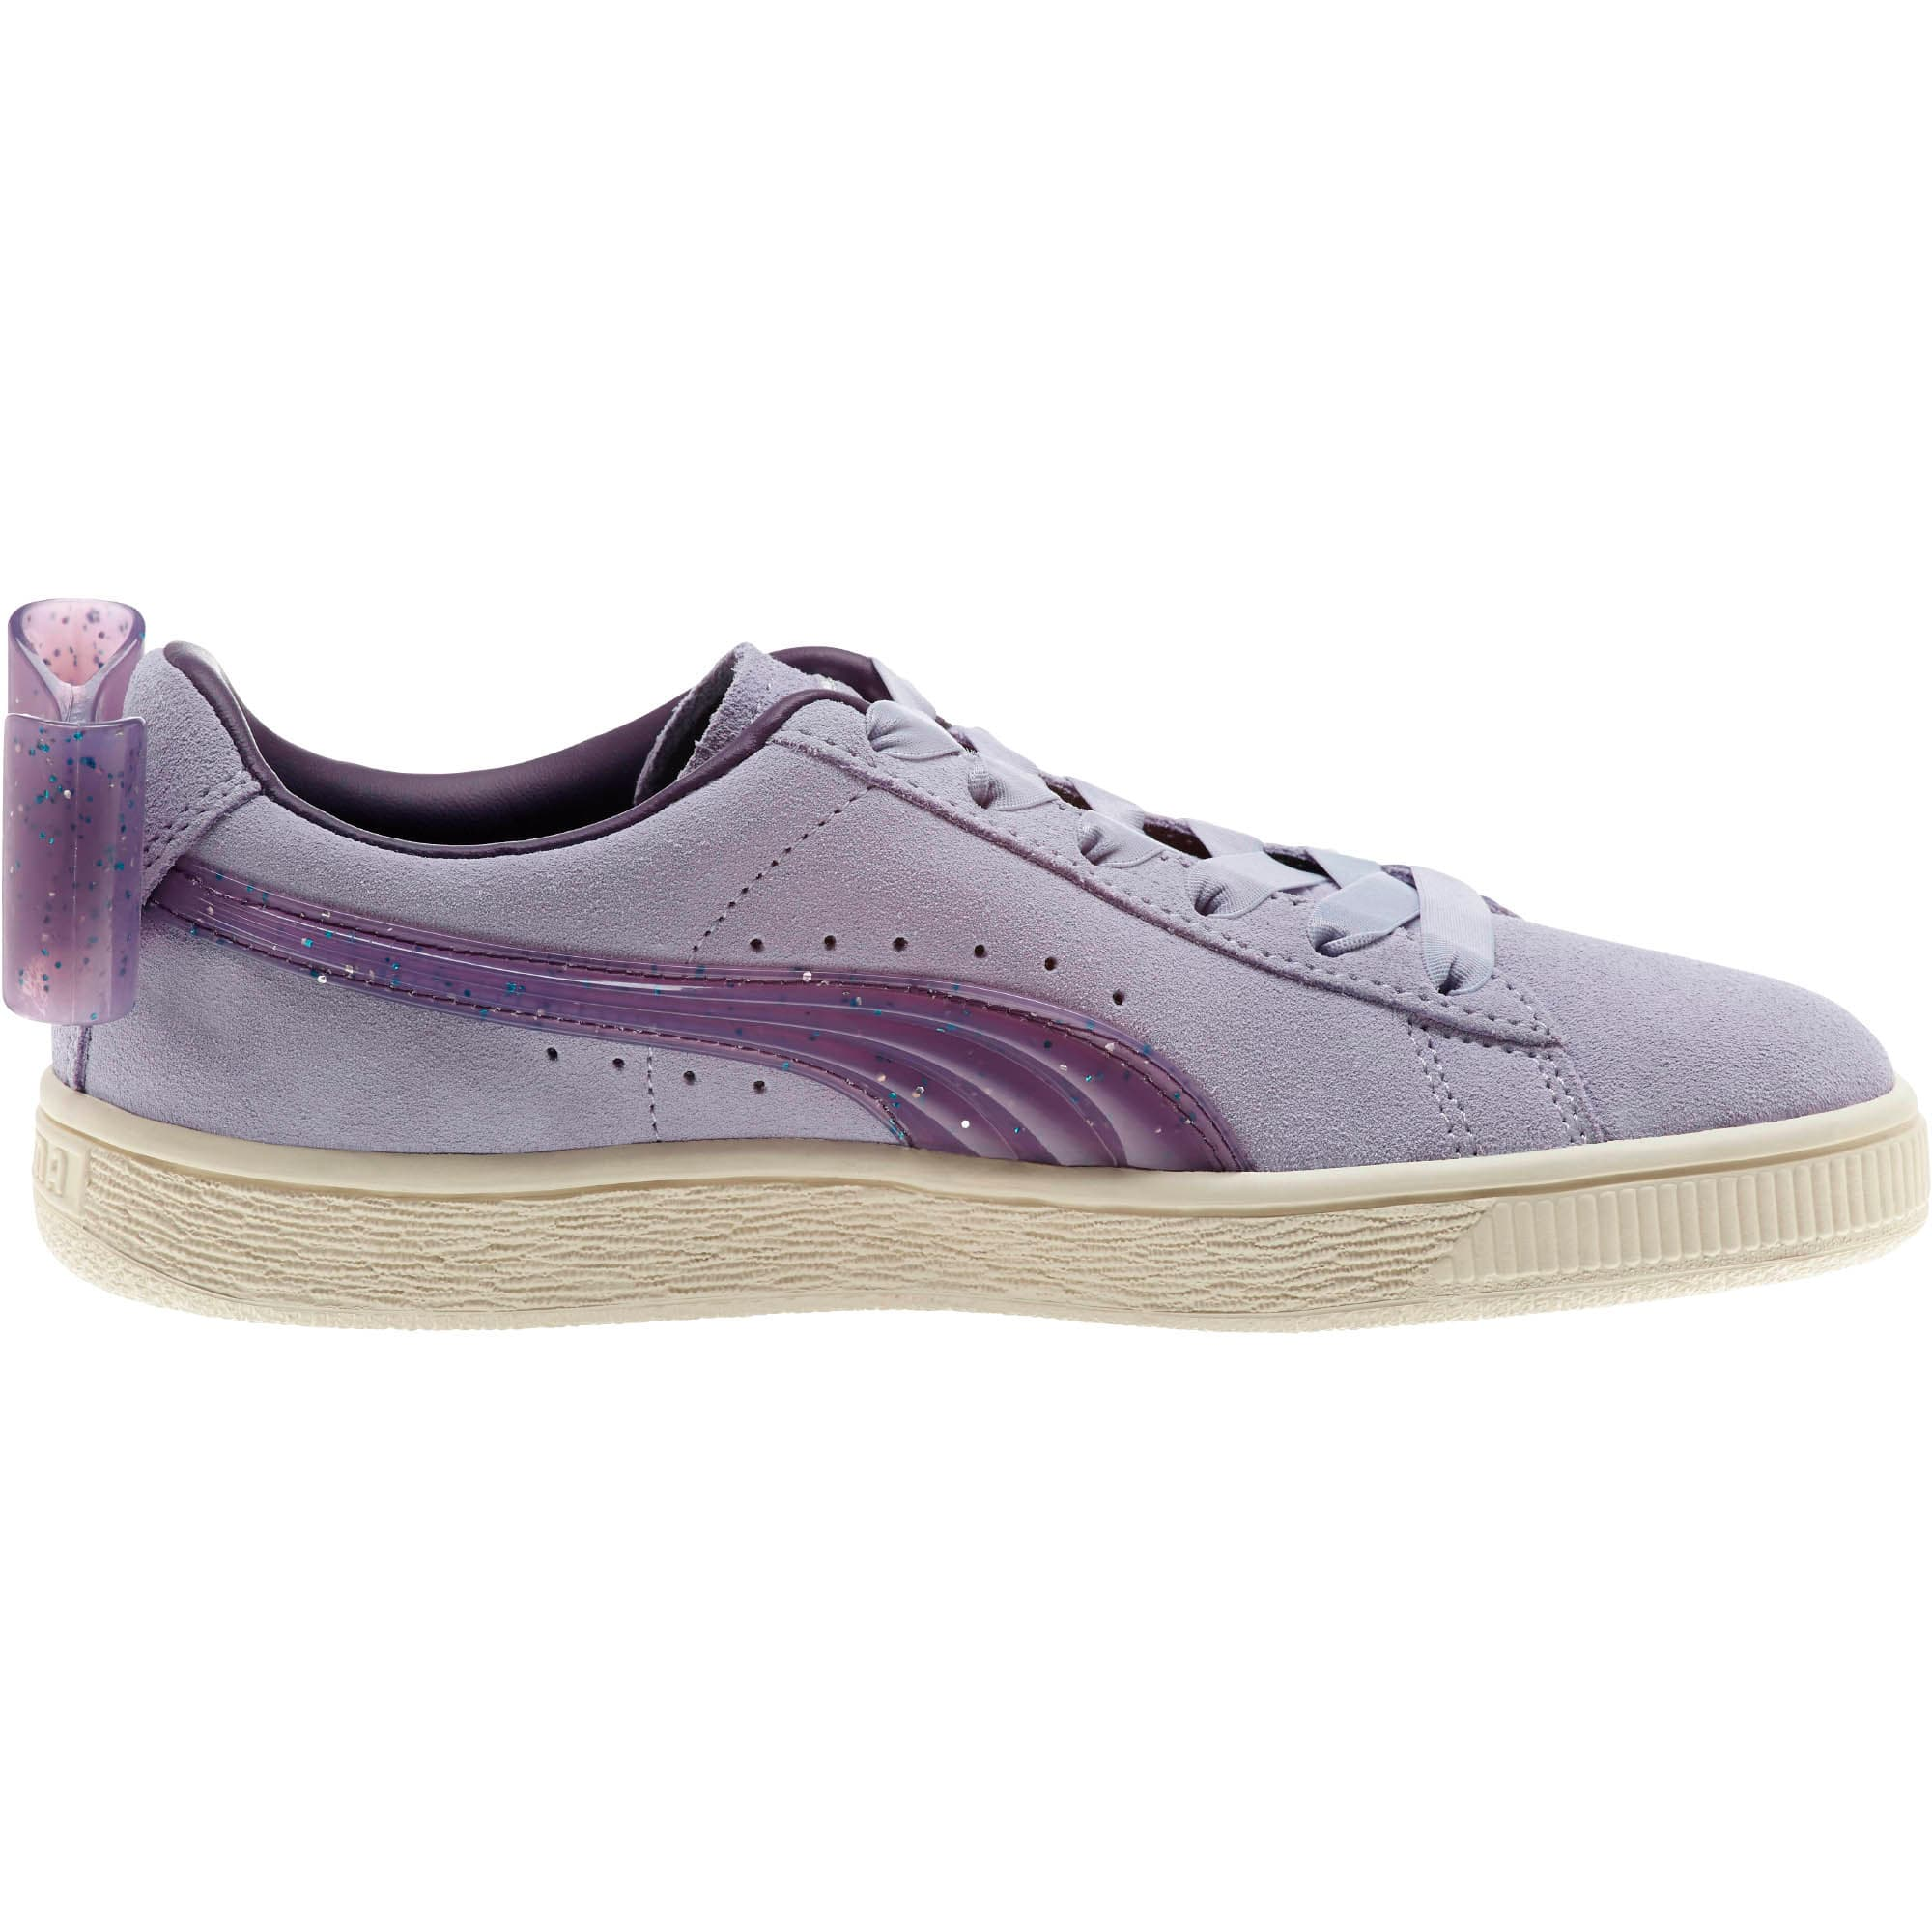 Miniatura 4 de Zapatos deportivos Suede Jelly Bow JR, SweetLavender-Indigo-White, mediano